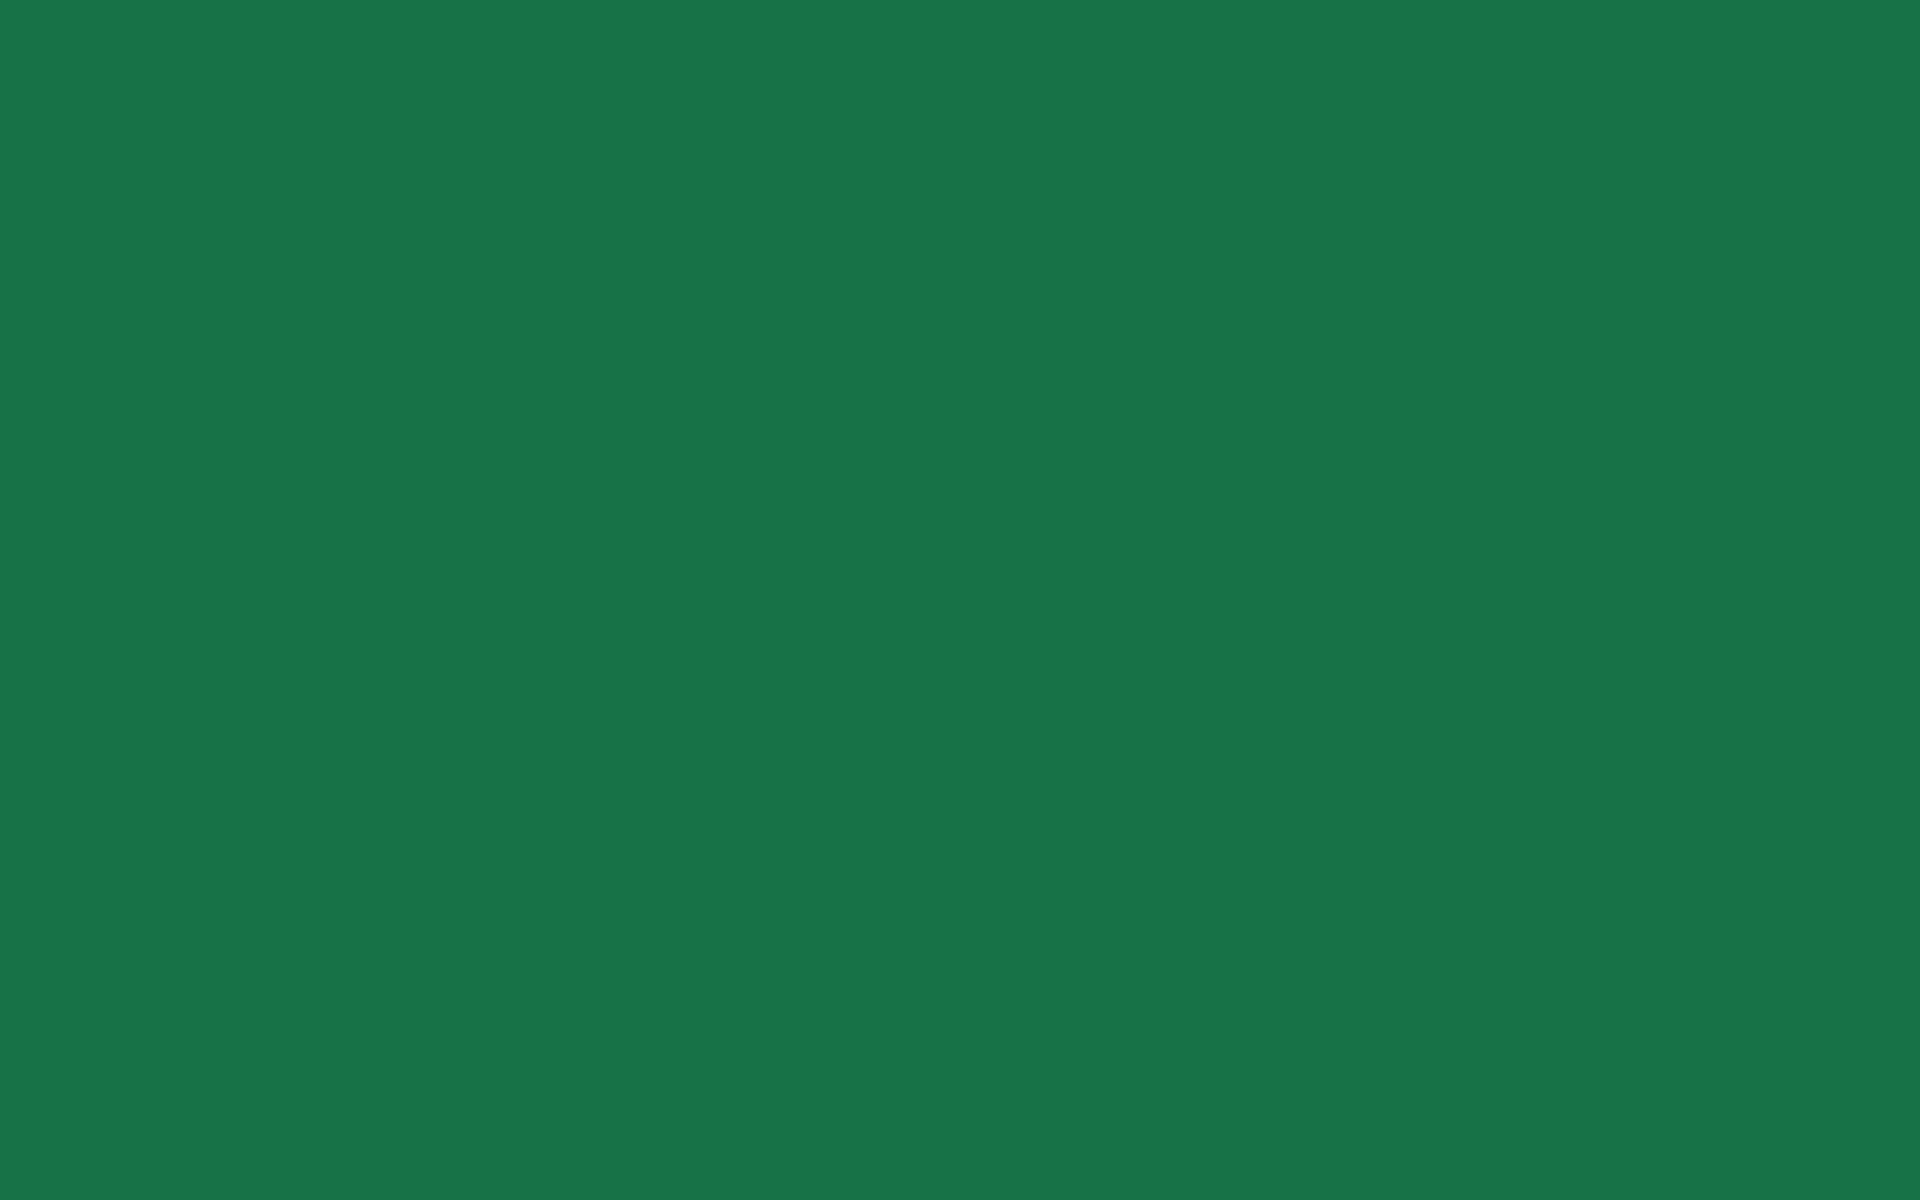 1920x1200 Dark Spring Green Solid Color Background